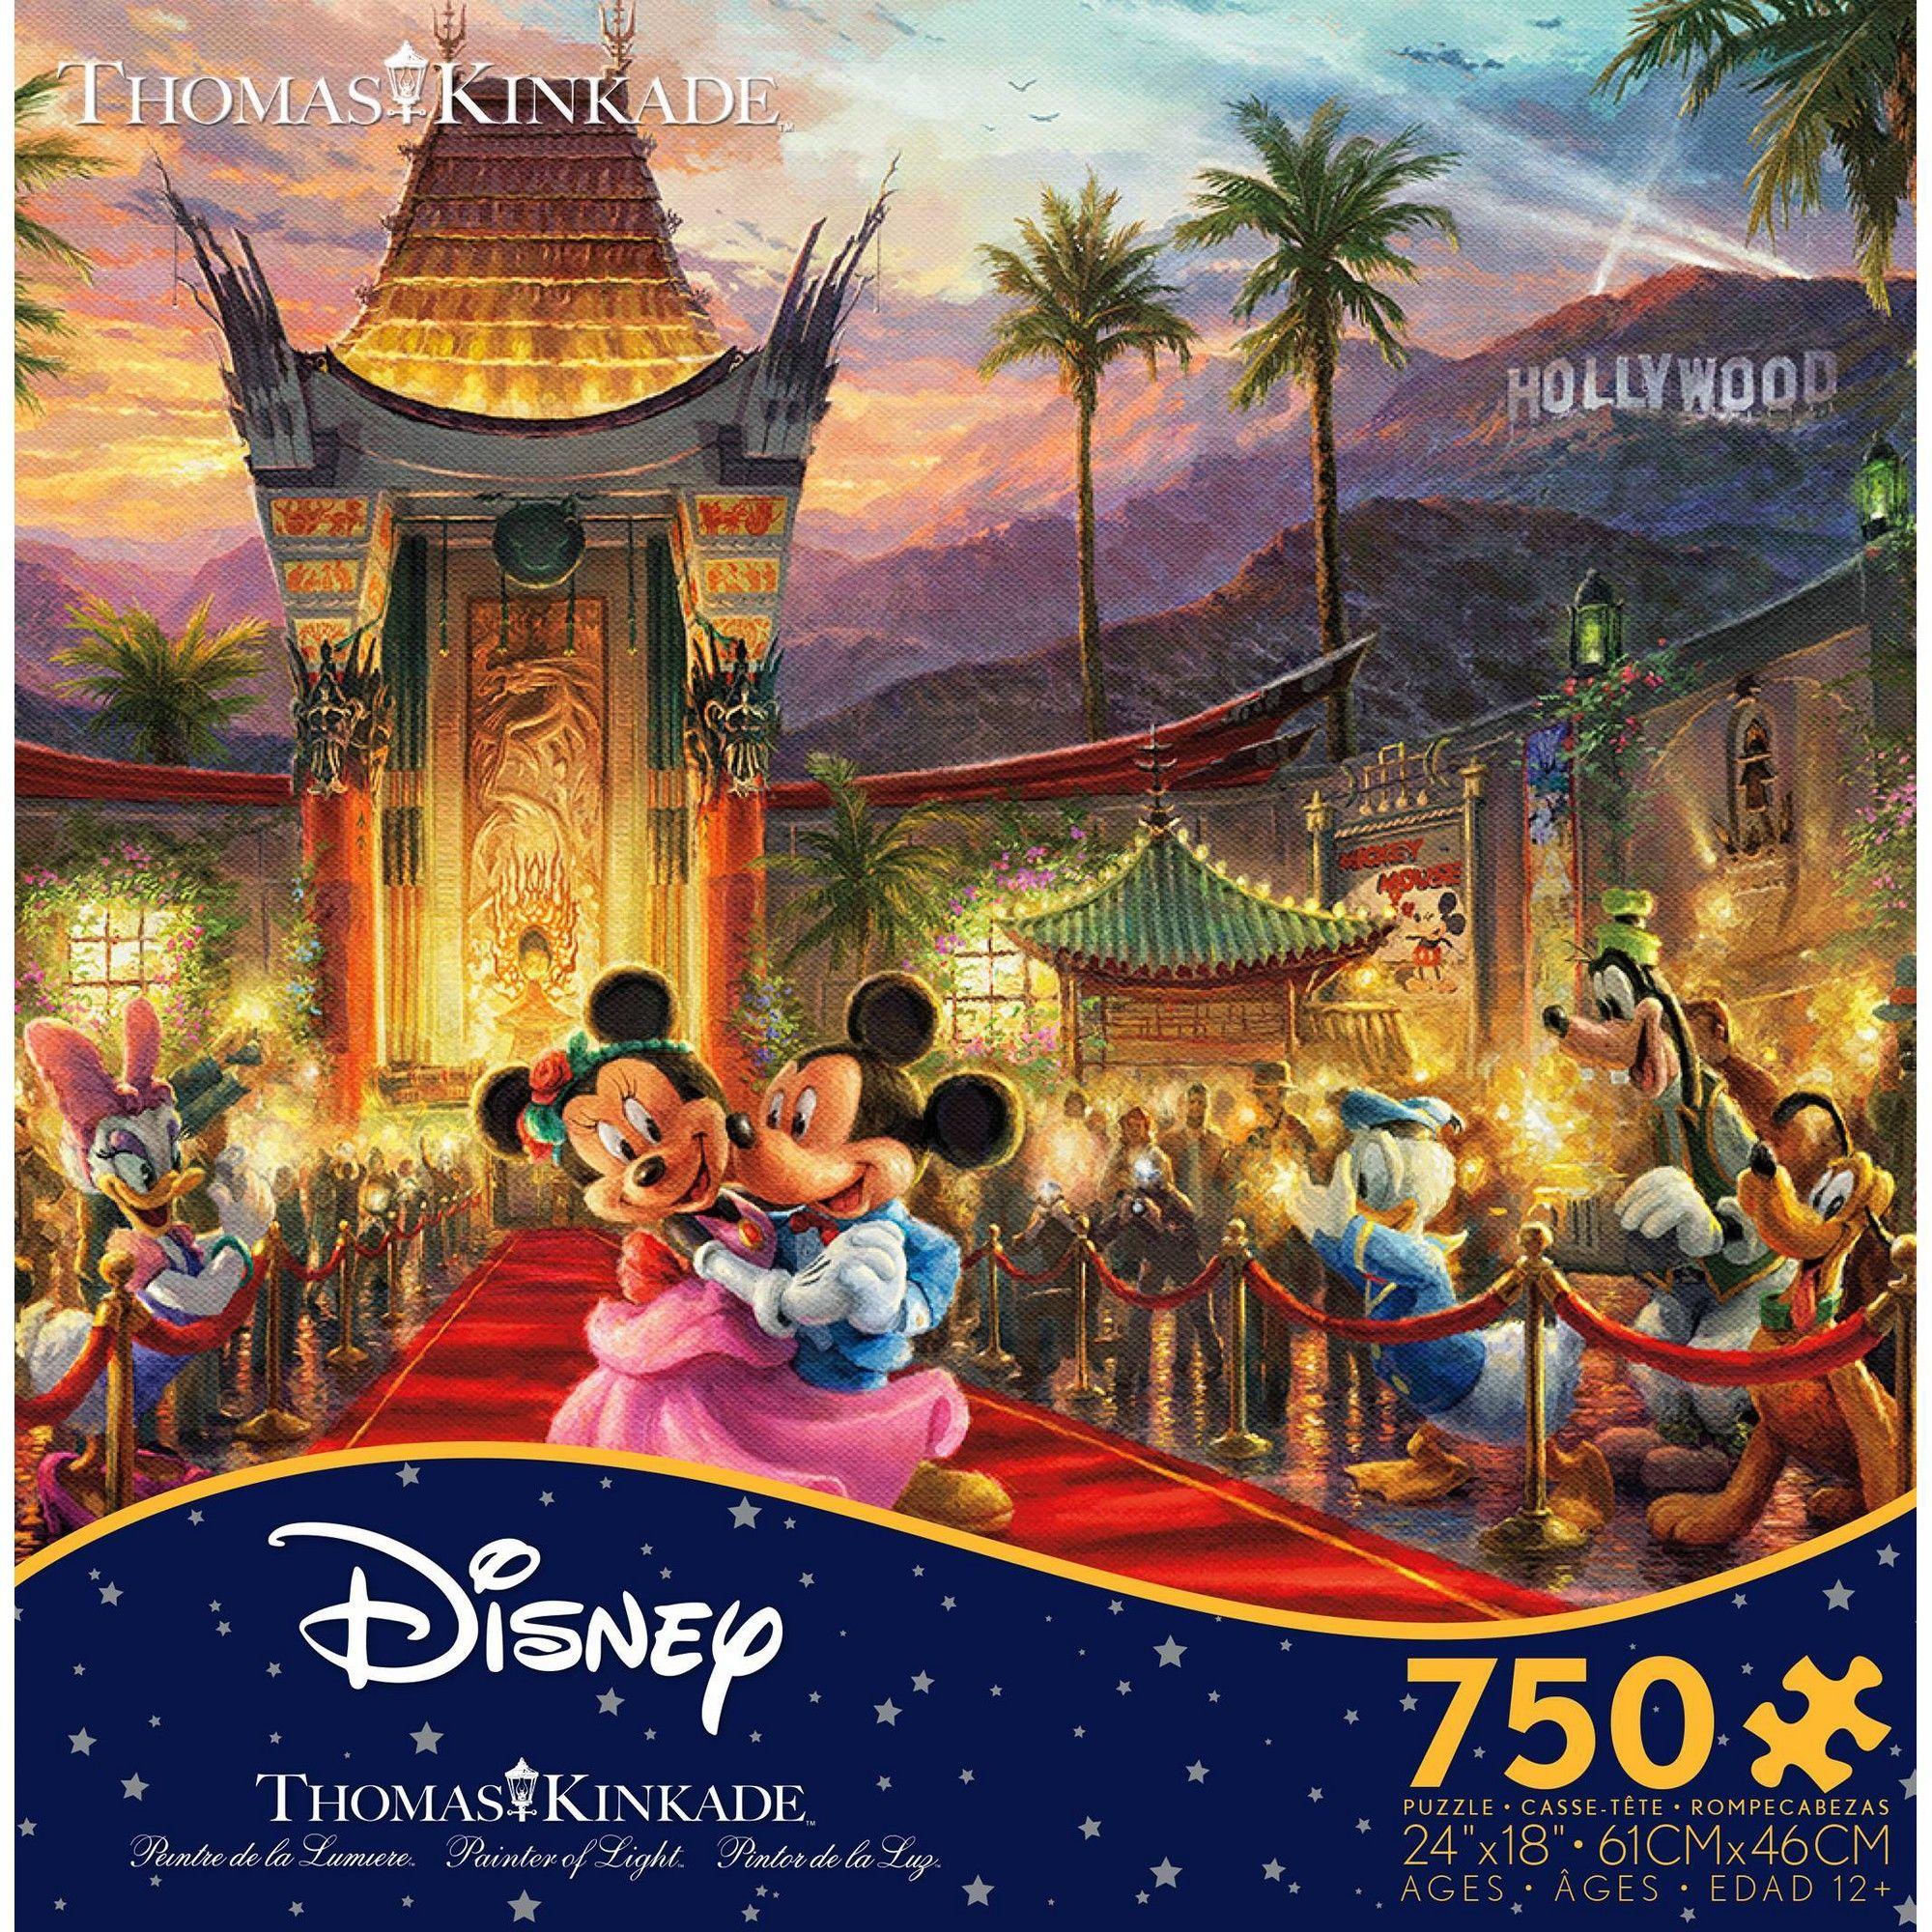 Disney Ceaco Thomas Kinkade Mickey Minnie Hollywwod 750 Pcs Puzzle New with Box